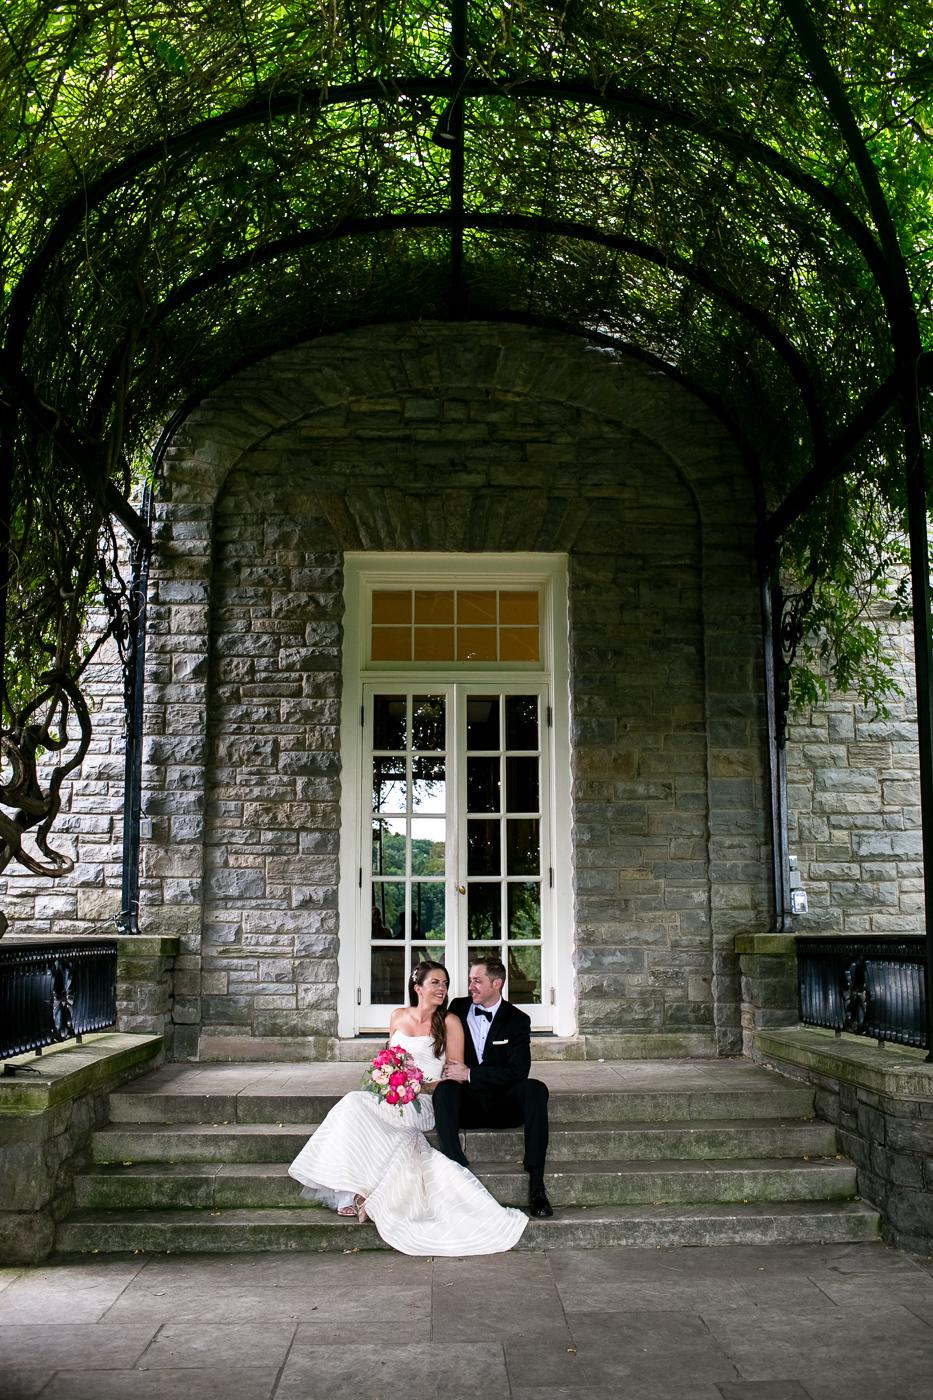 Husk's Carriage House Wedding - Cheekwood Botanical Gardens Wedding - Nashville Wedding - Wedding Blog-The Overwhelmed Bride